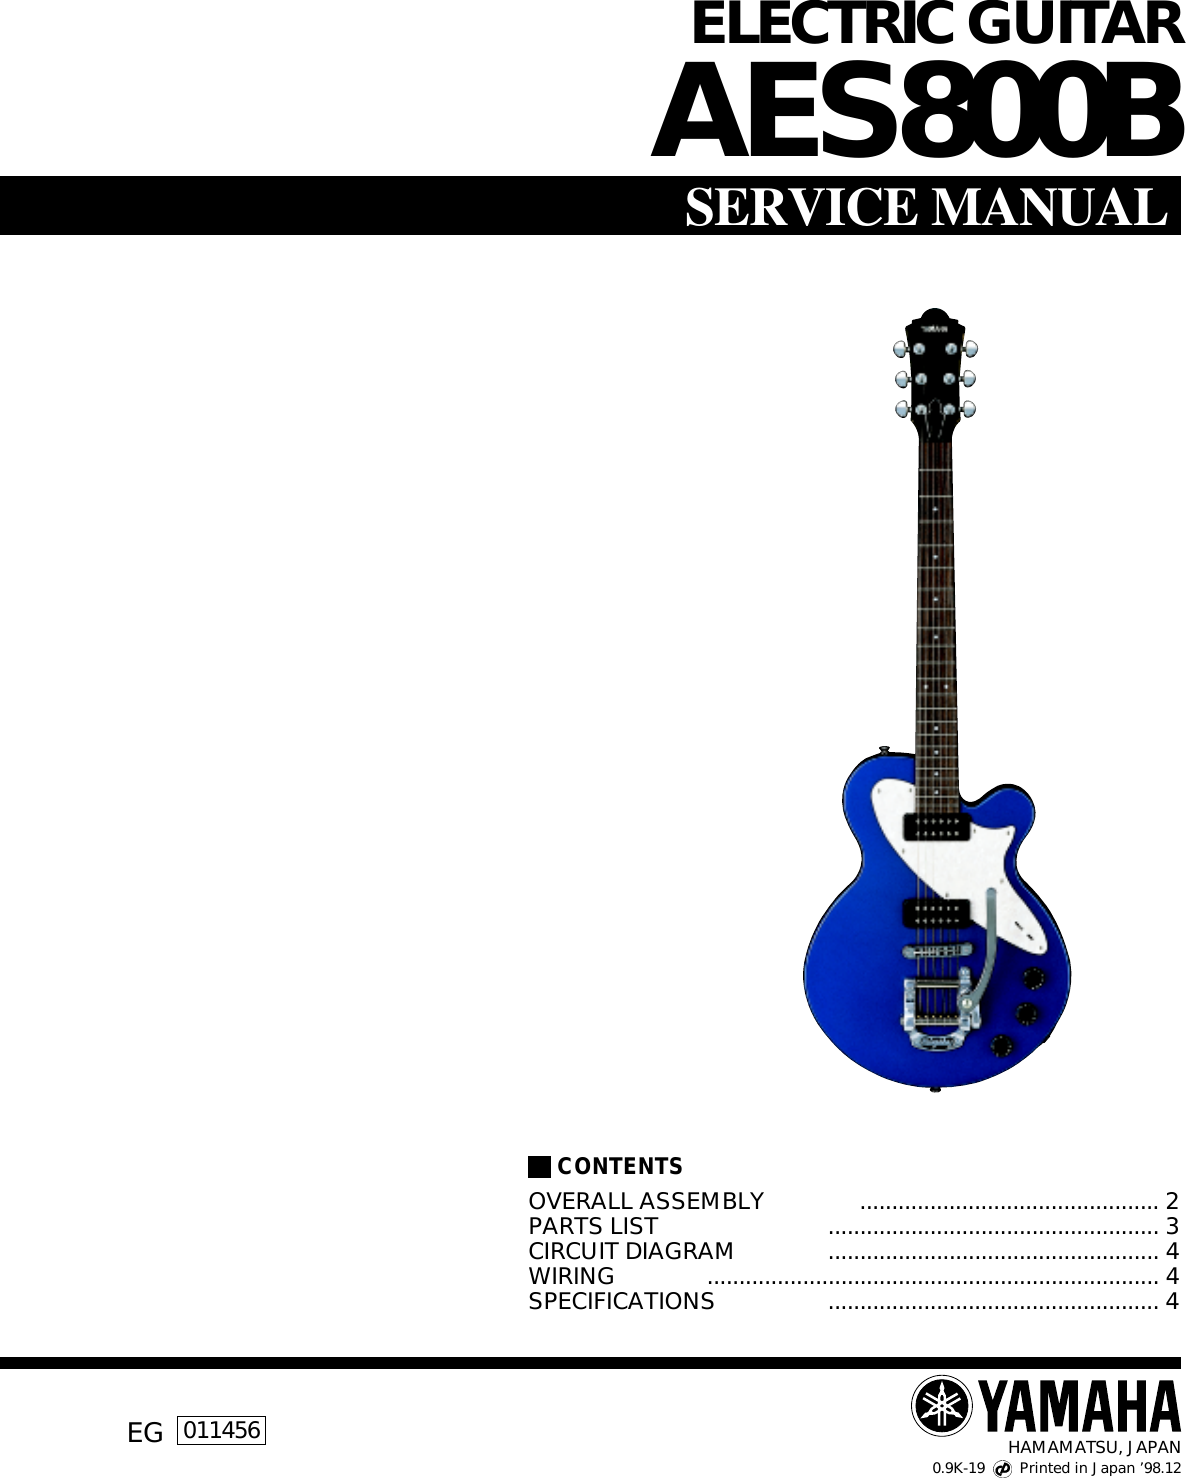 Yamaha Guitar Eg 011456 Users Manual Electric Acoustic Parts Diagram